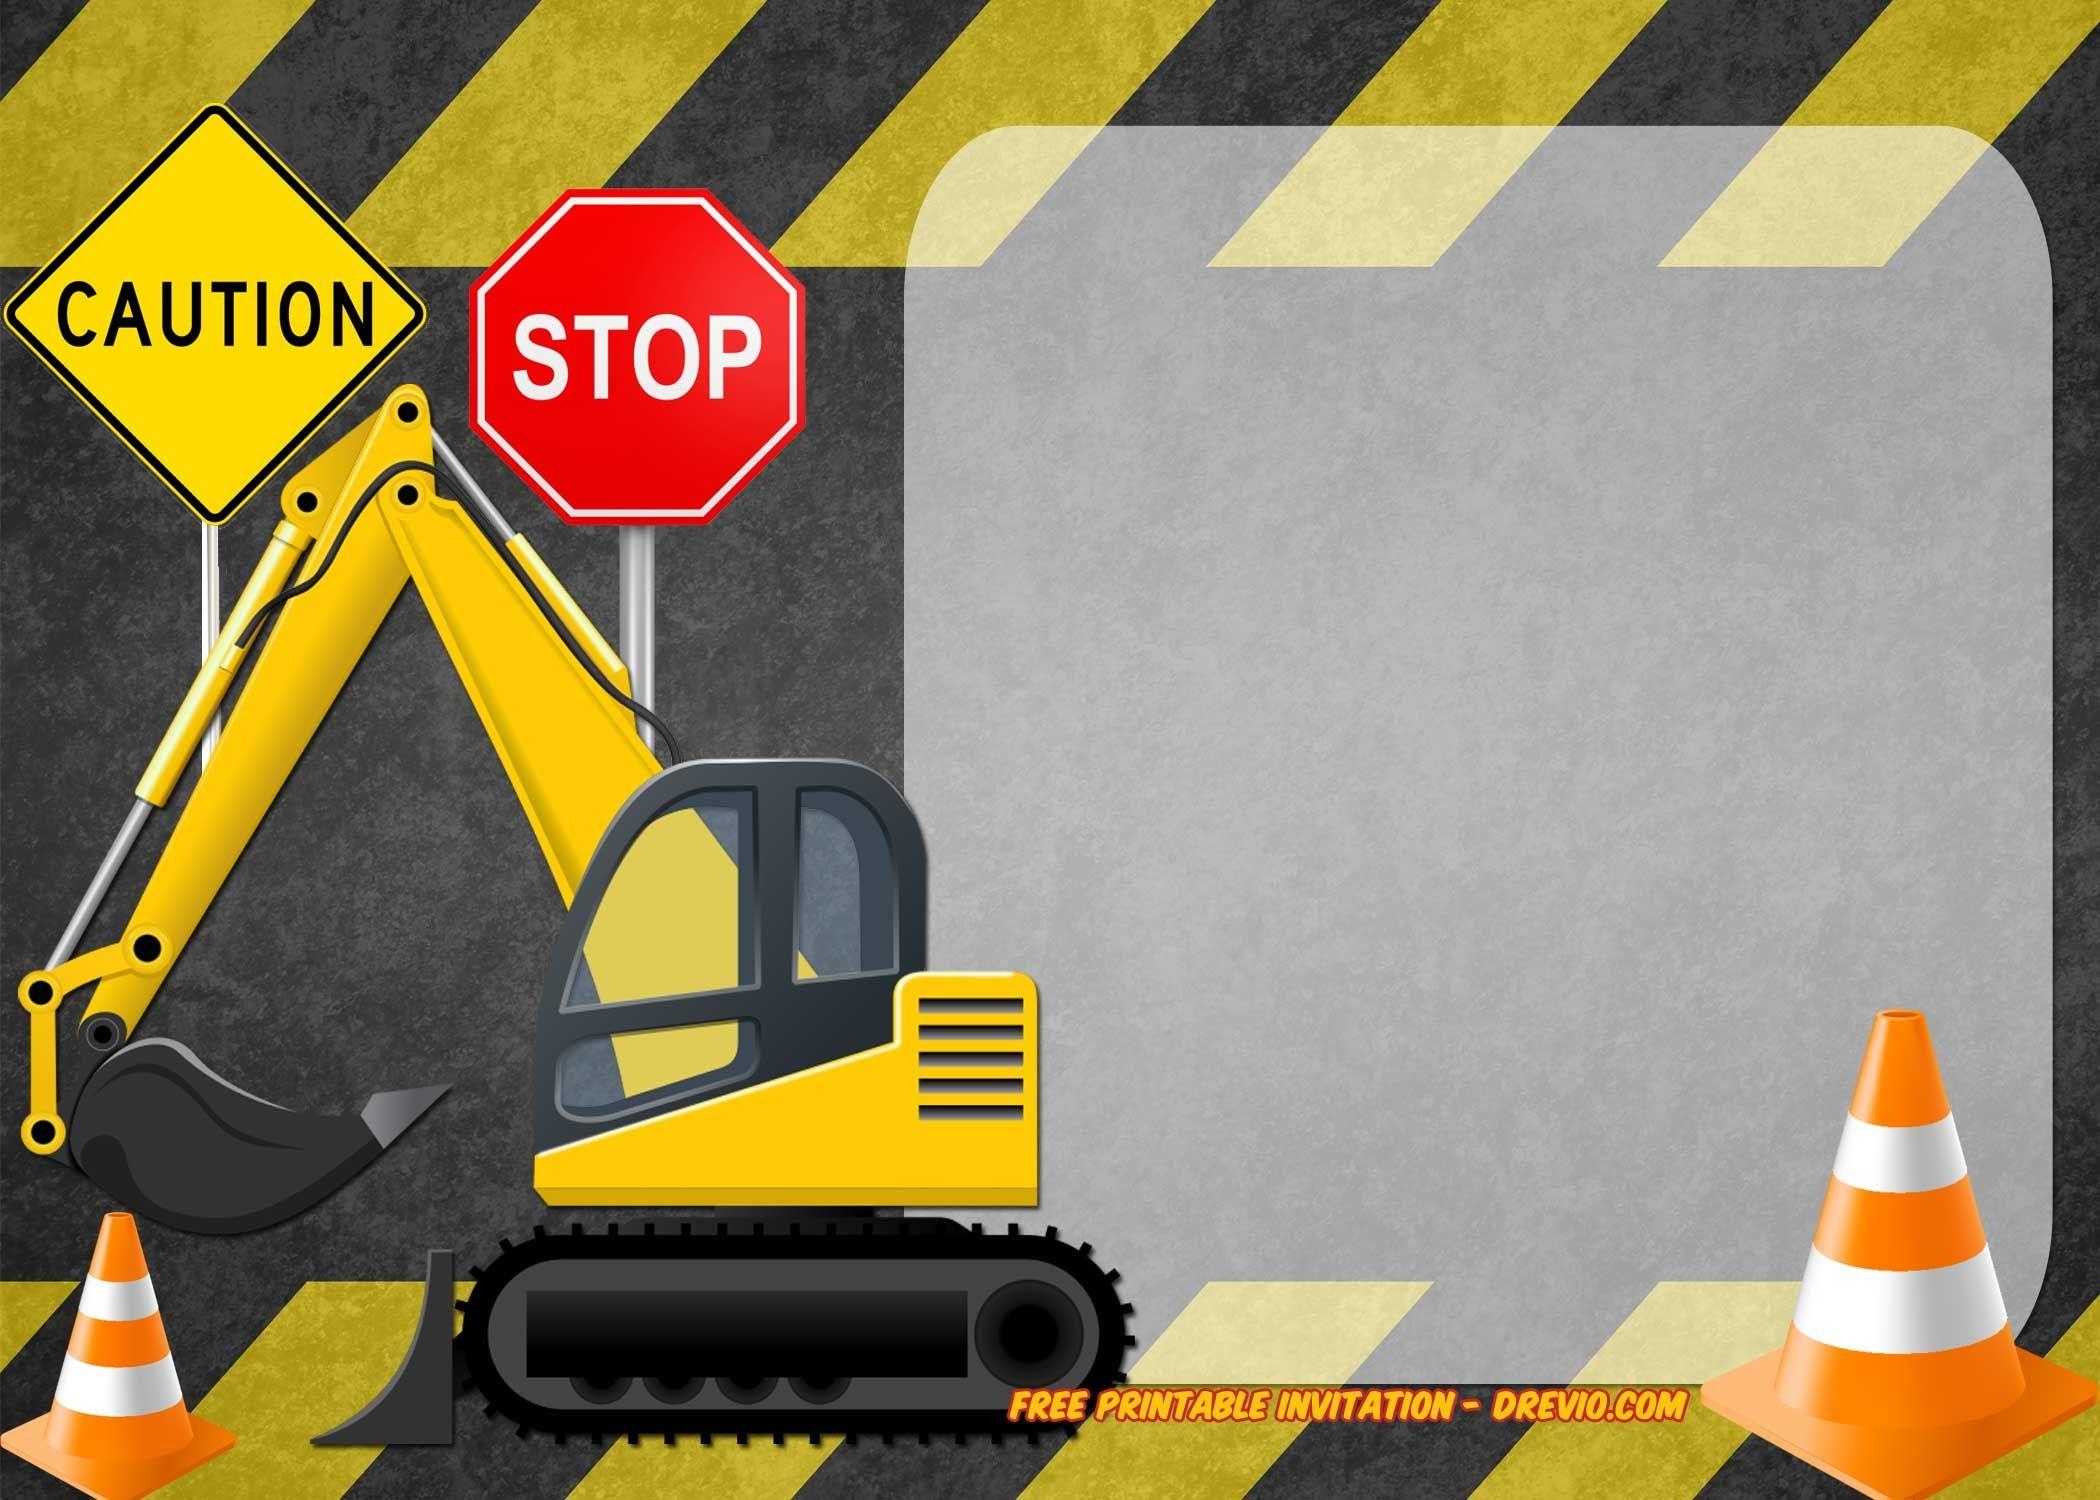 Free Printable Construction Vehicles Birthday Invitation   Free - Free Printable Construction Invitations